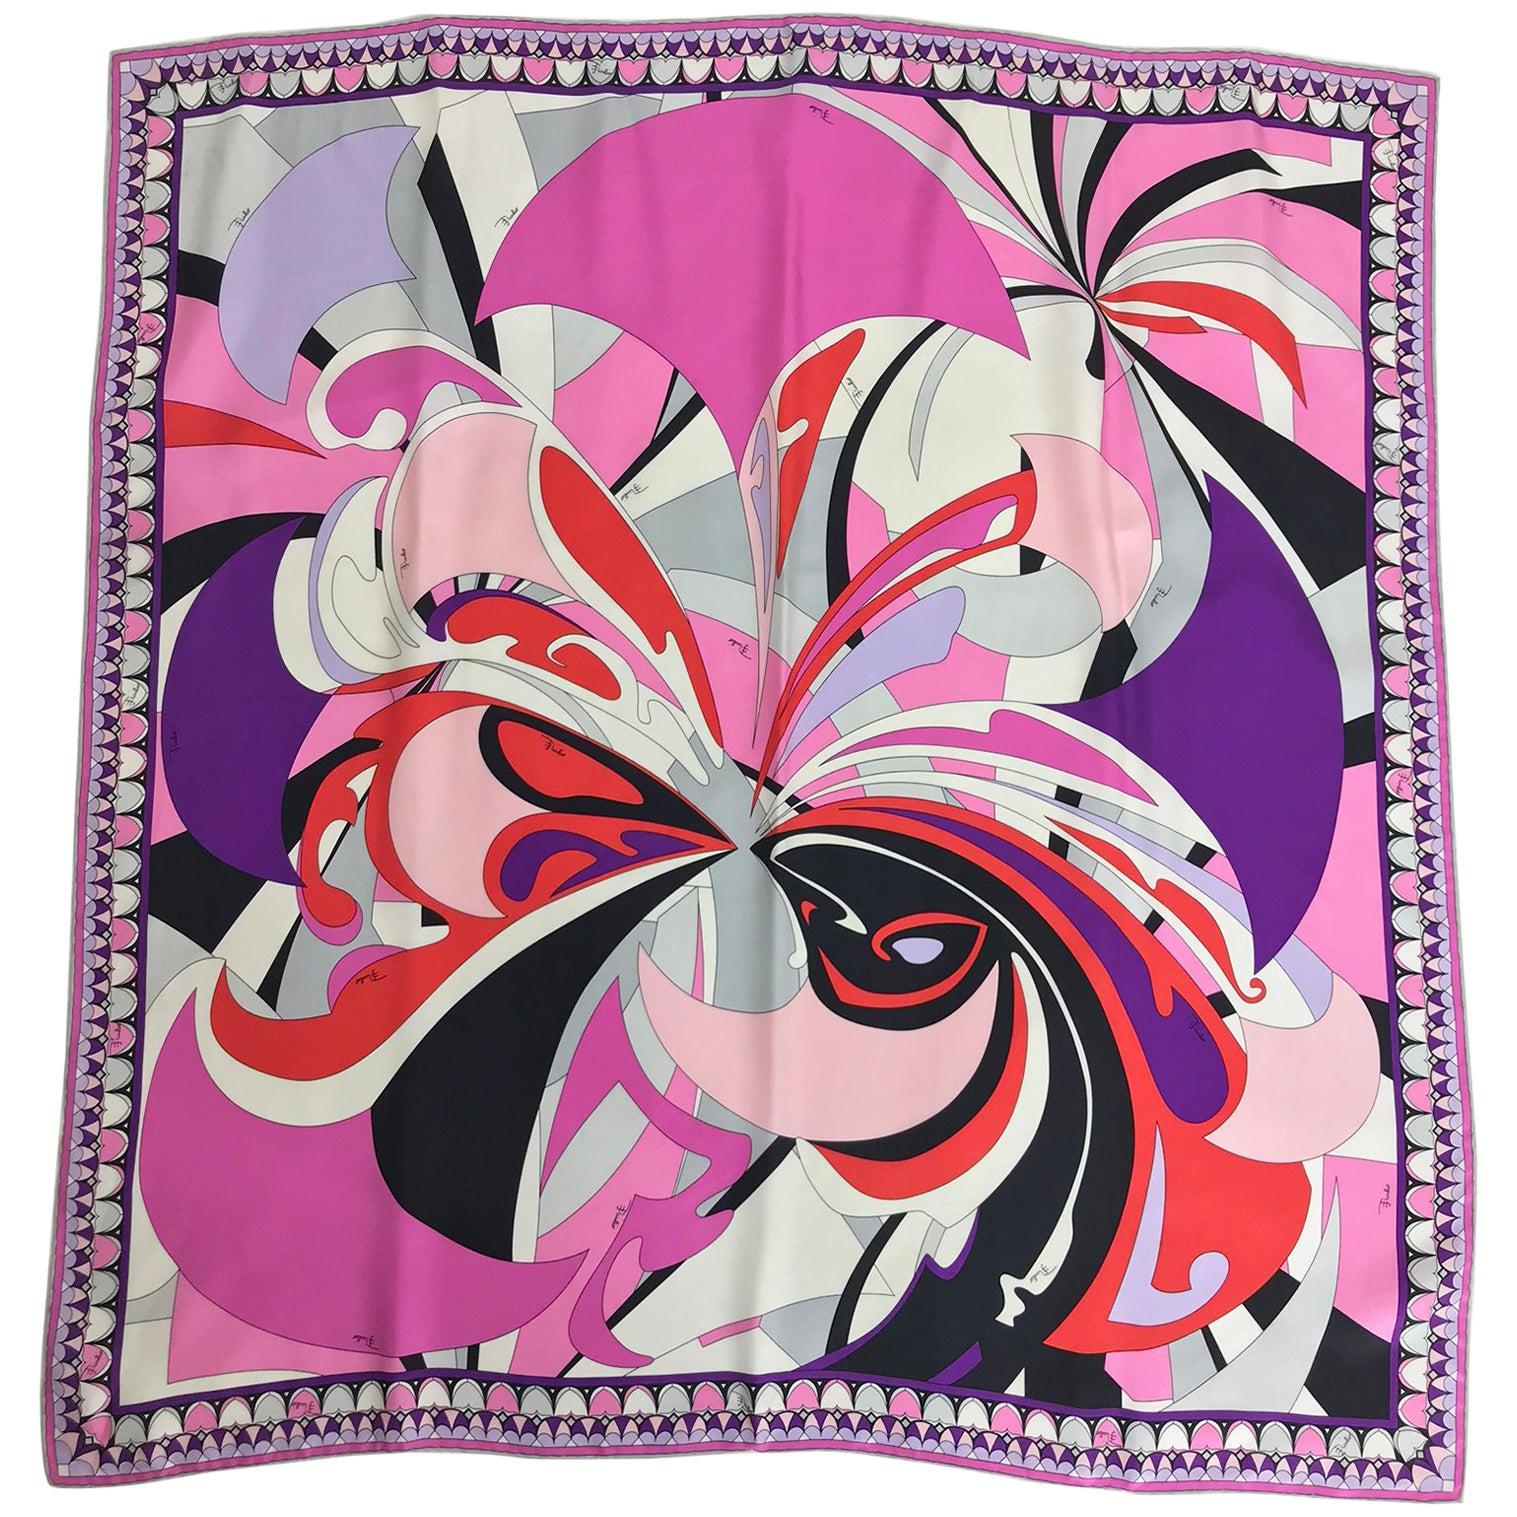 Pucci signed silk twill print scarf 34 x 34